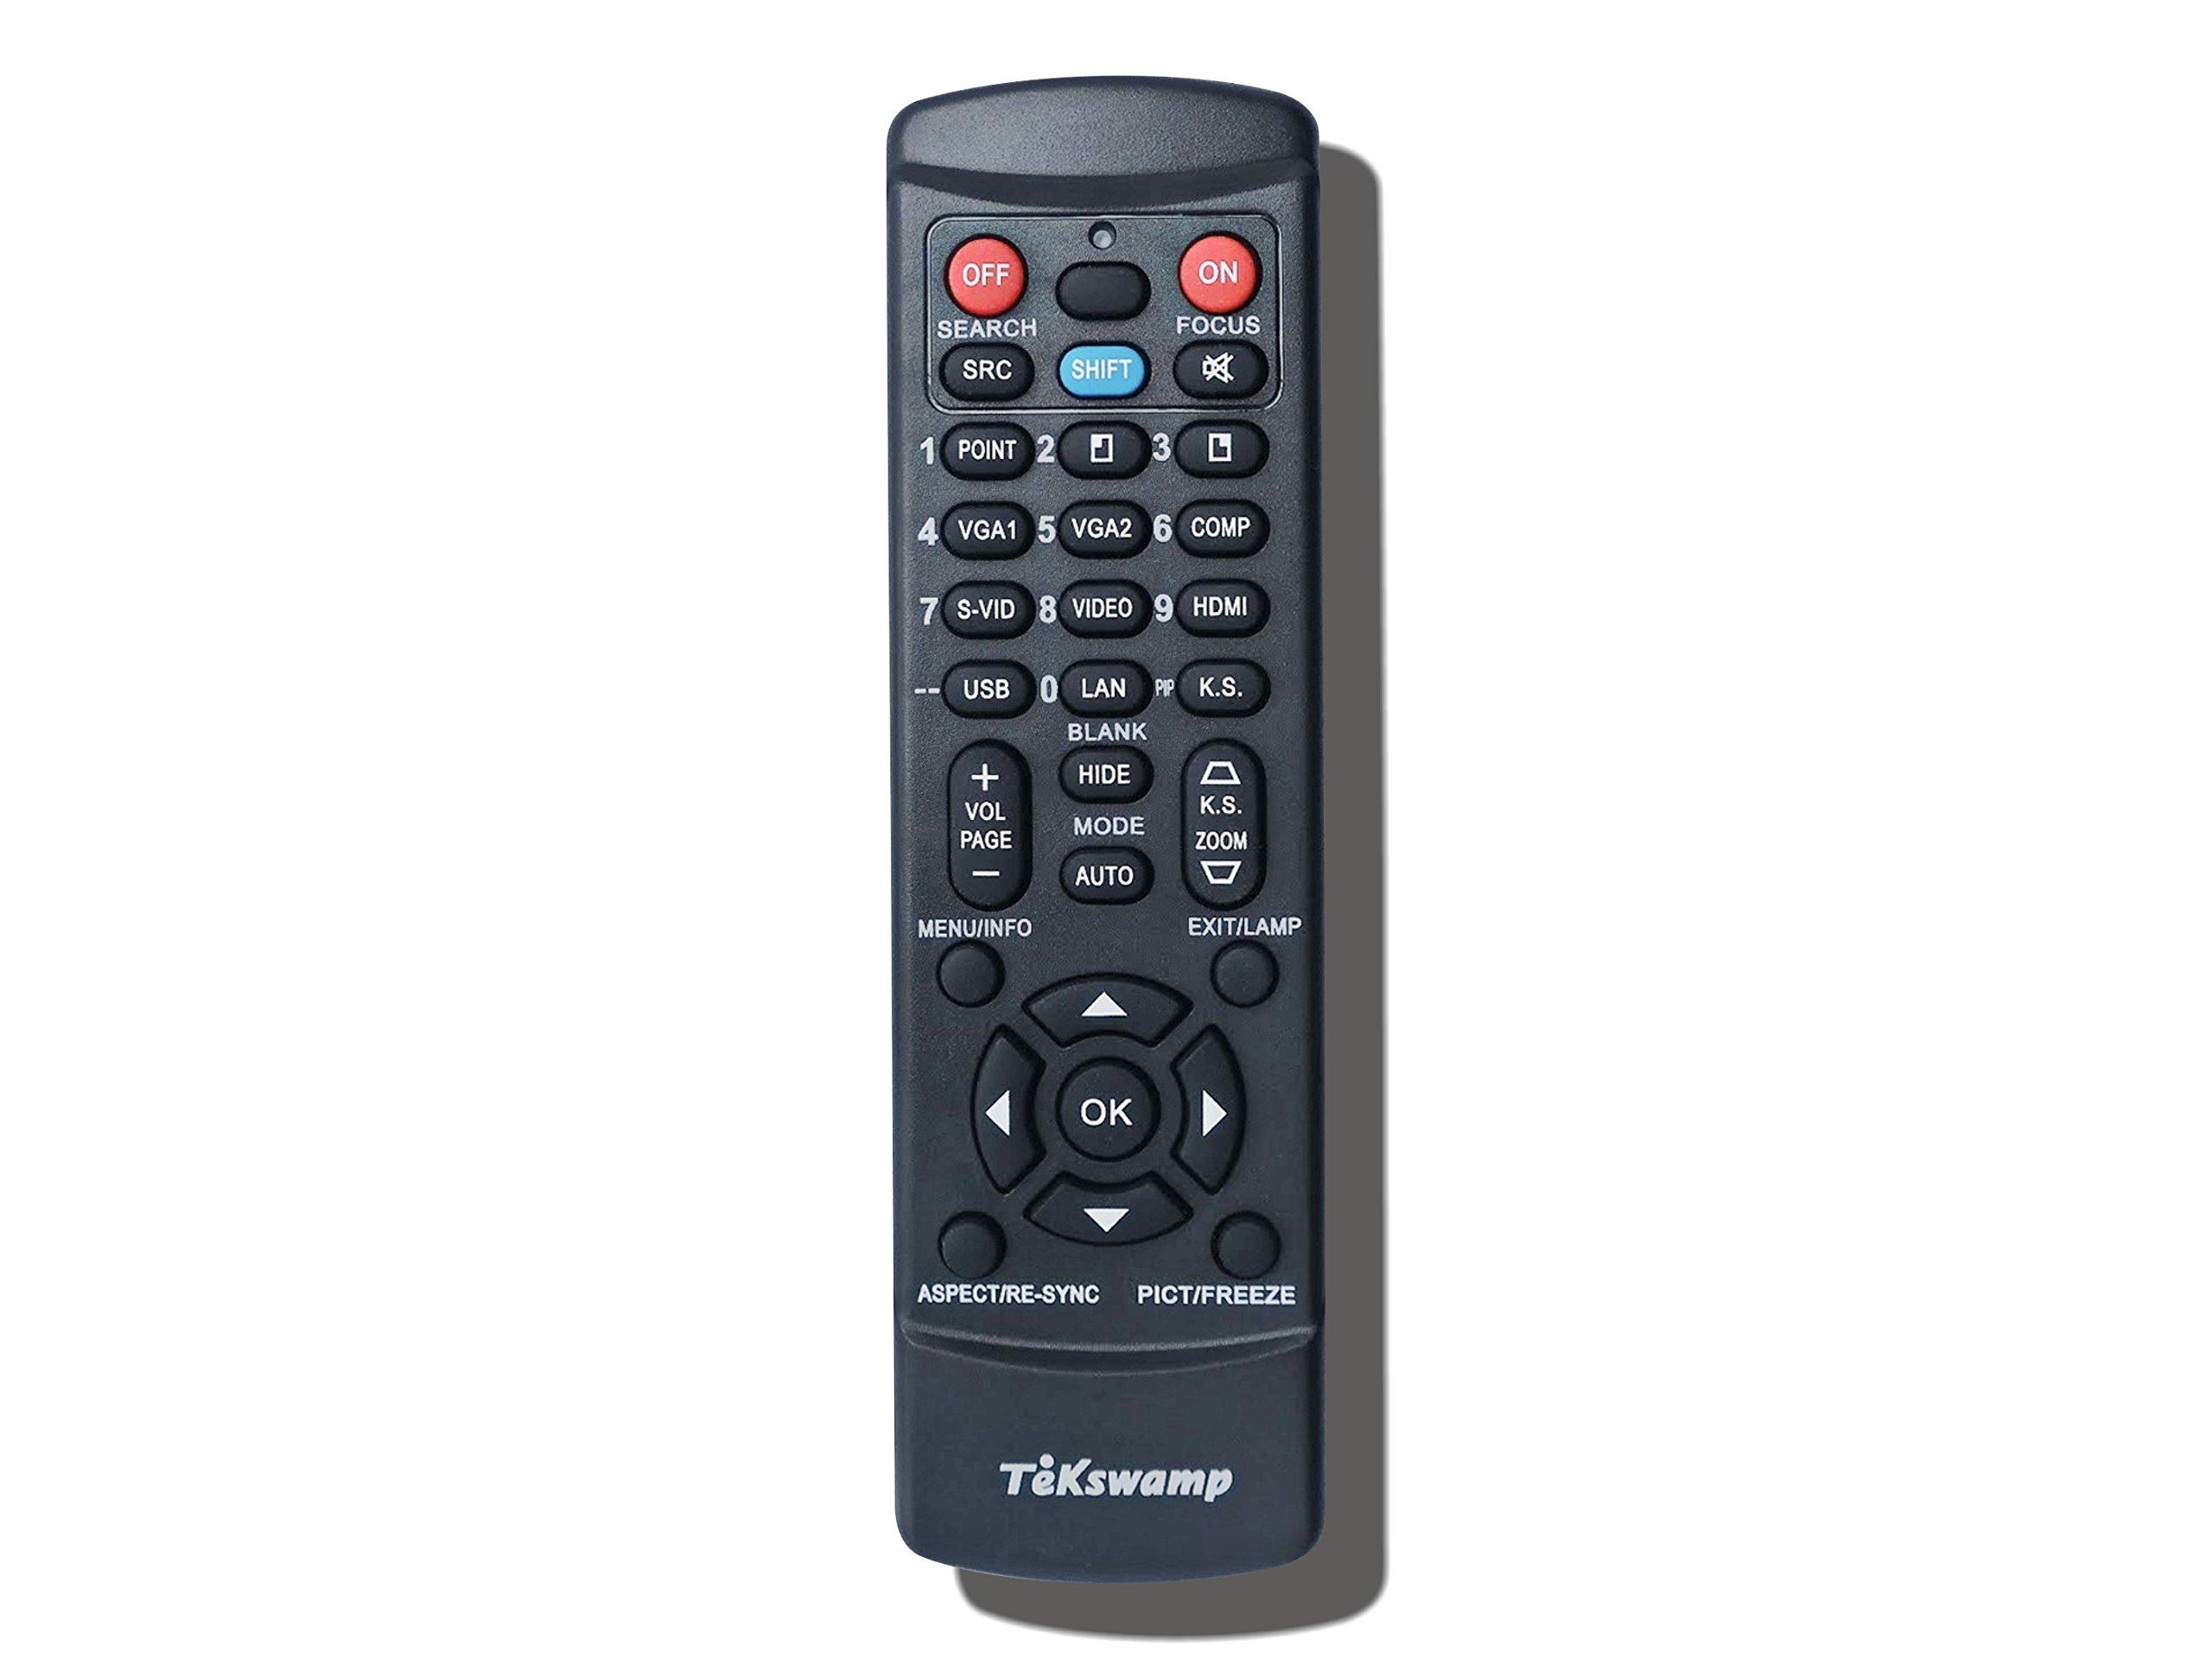 Sony DVP-CX995V TeKswamp Remote Control (Black) by Tekswamp (Image #2)